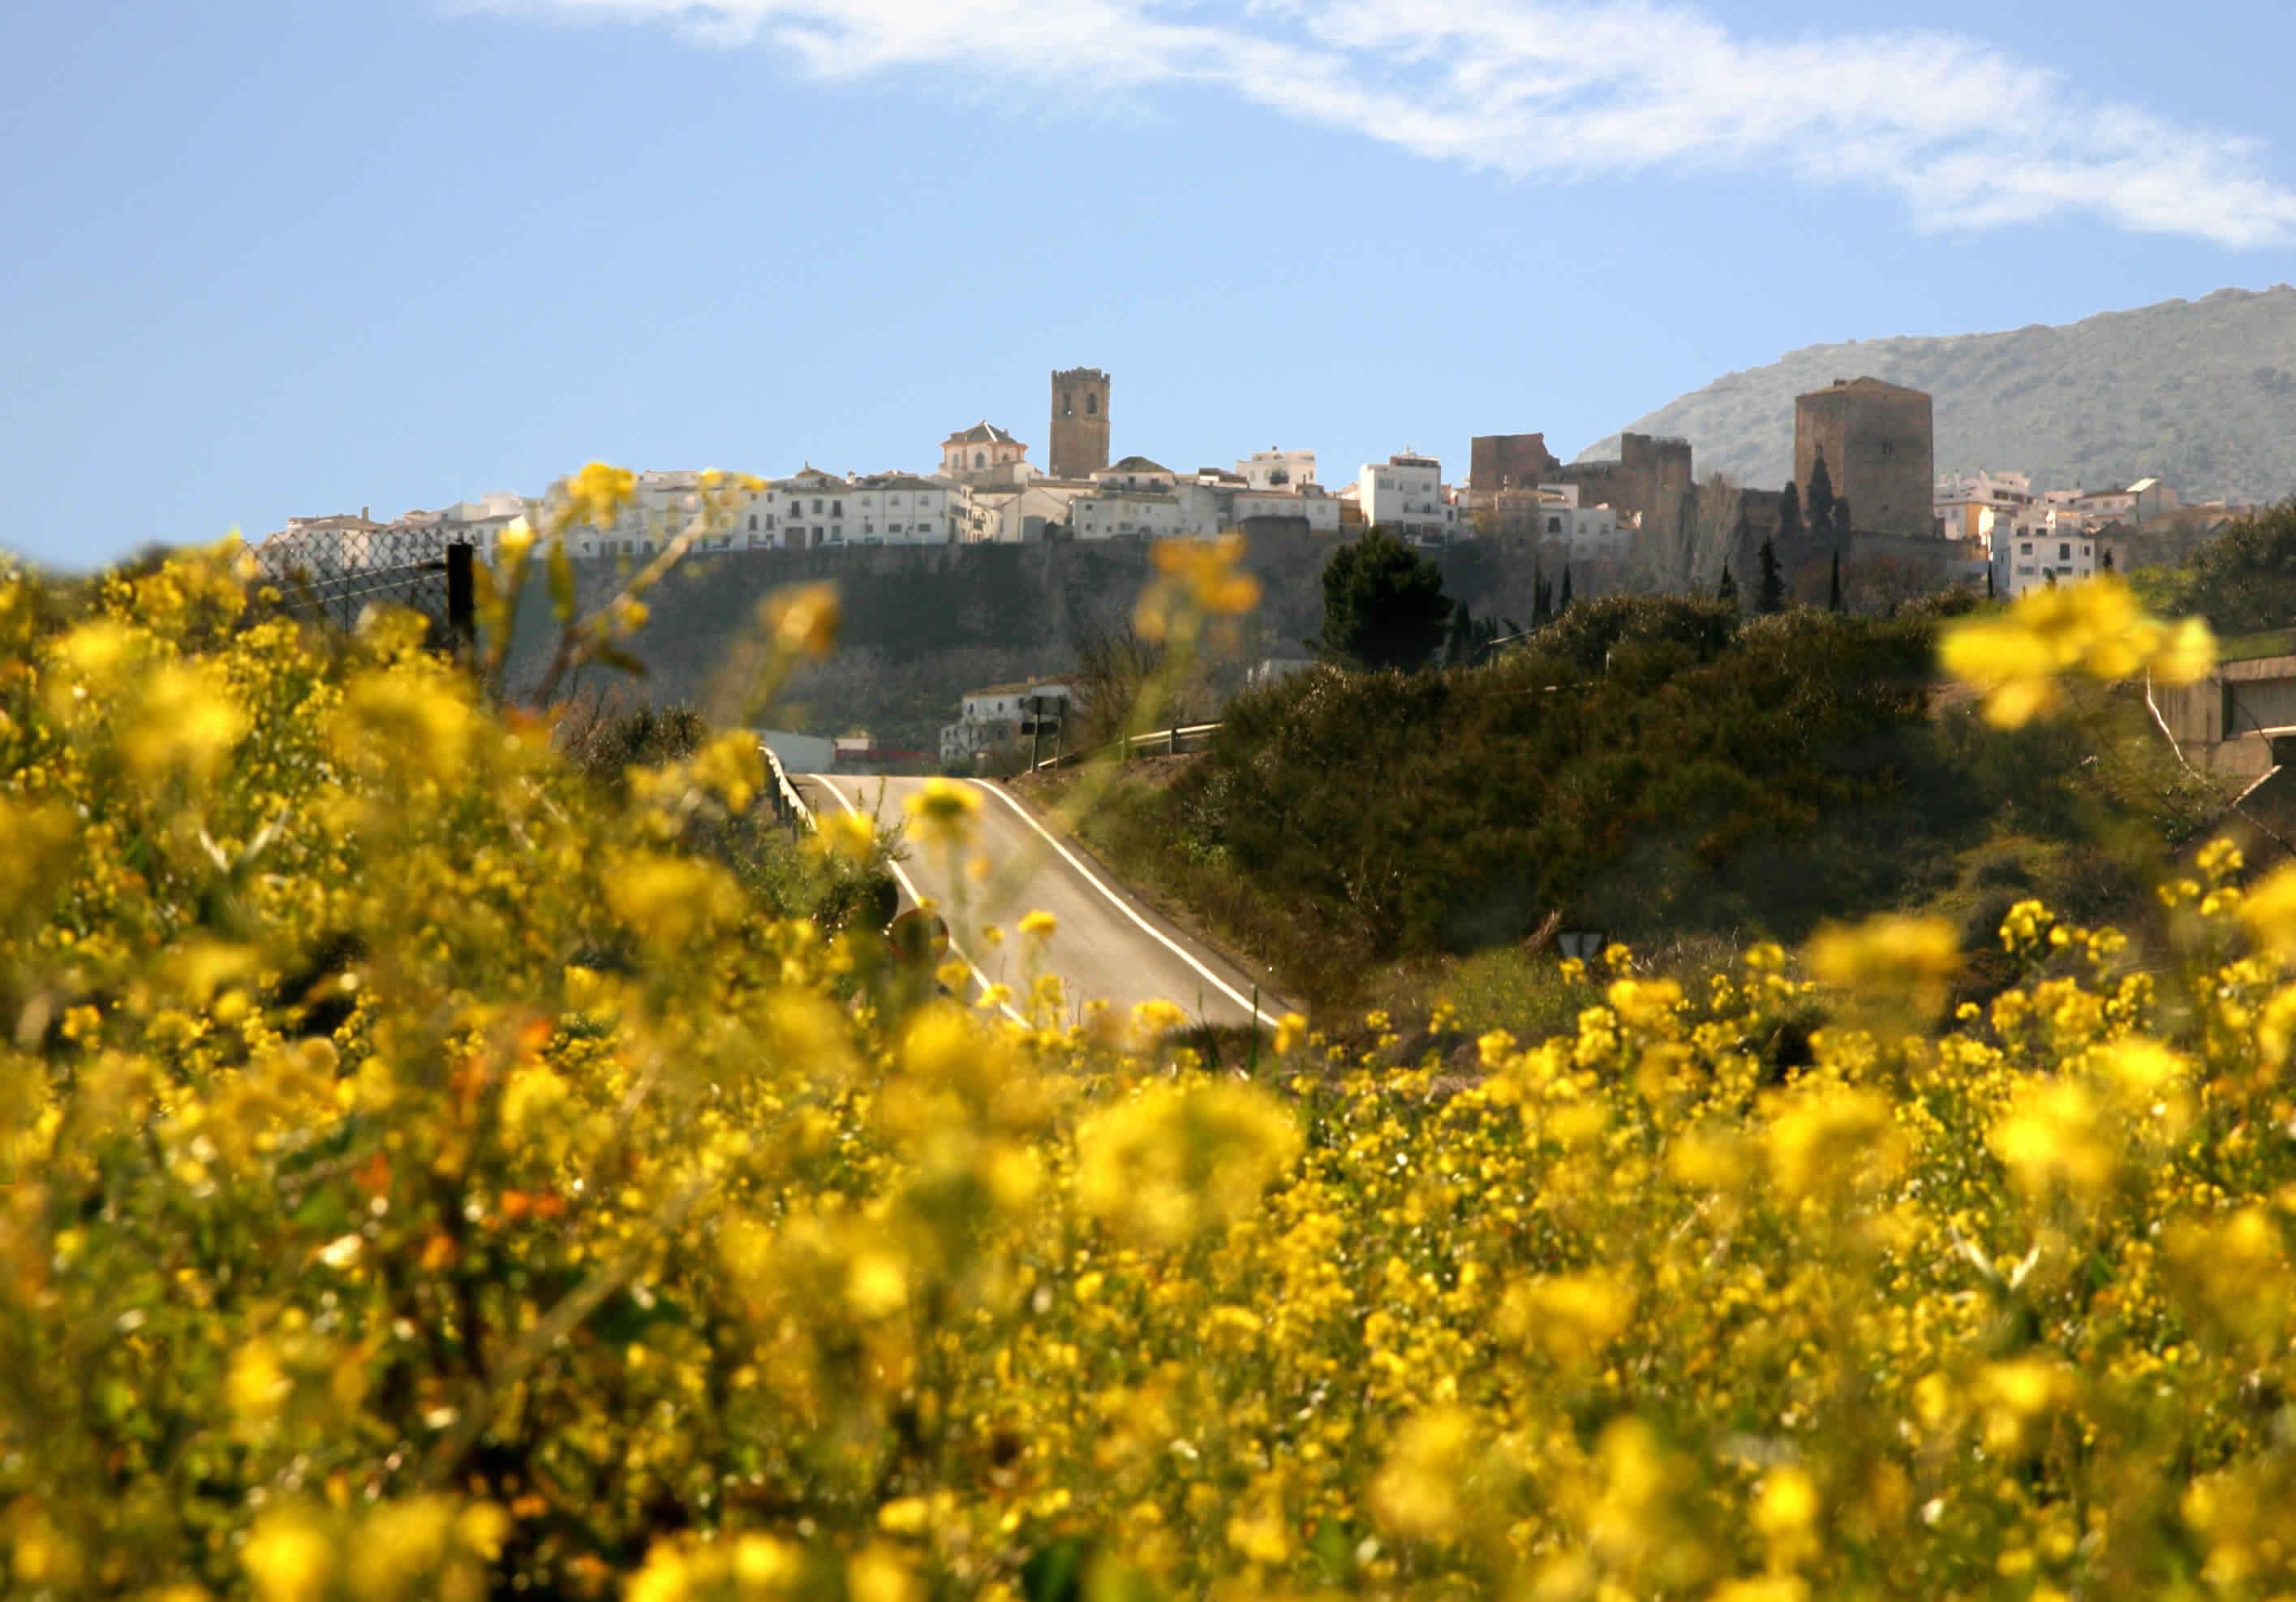 Blick auf Priego de Córdoba in Andalusien